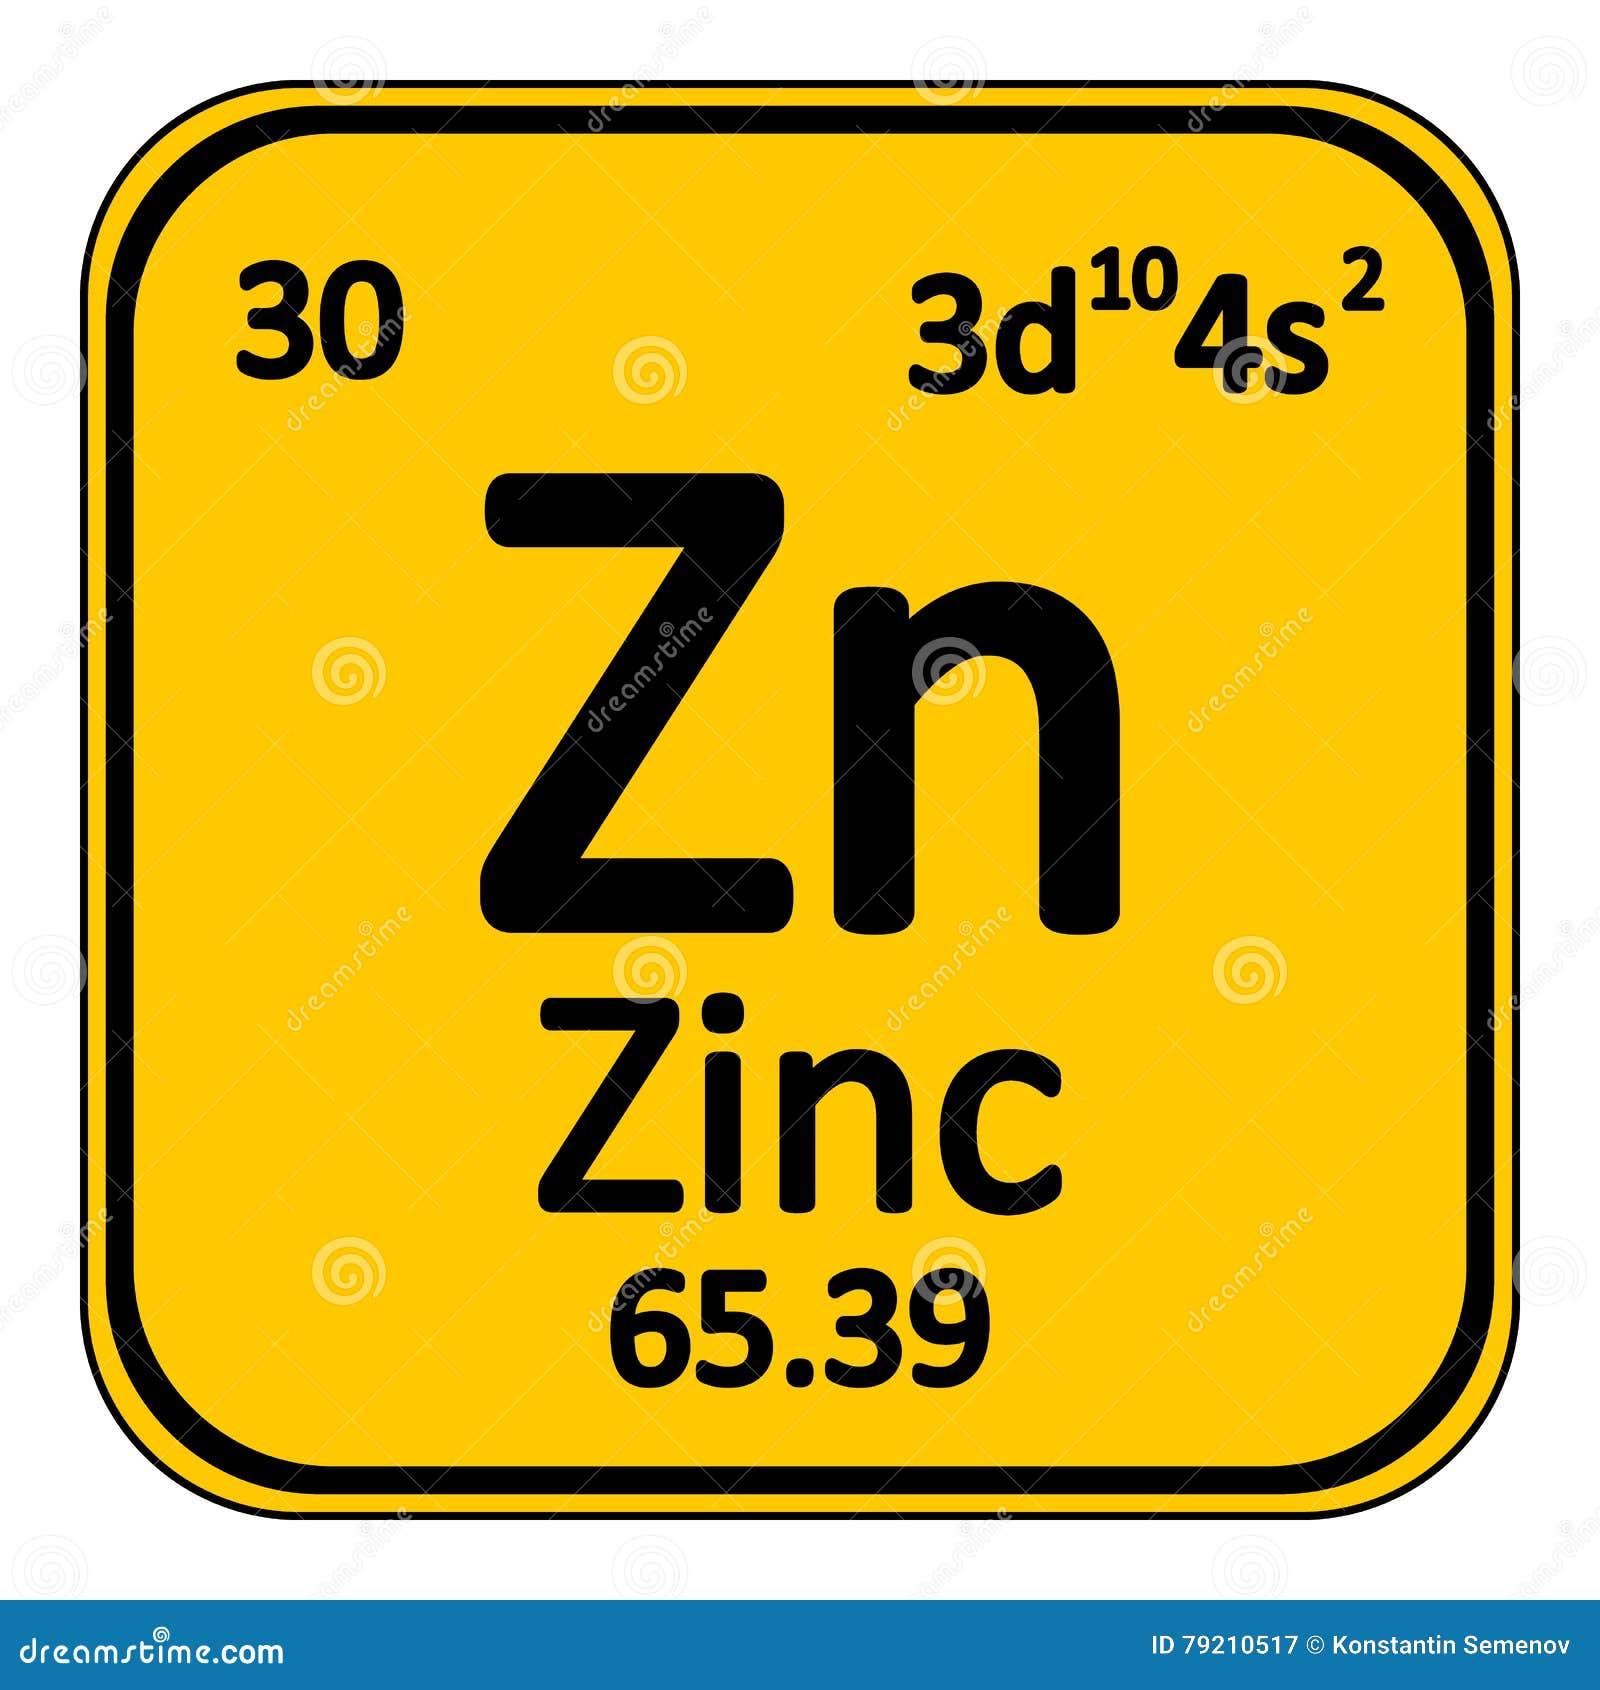 Periodic table element zinc icon stock illustration illustration periodic table element zinc icon buycottarizona Gallery